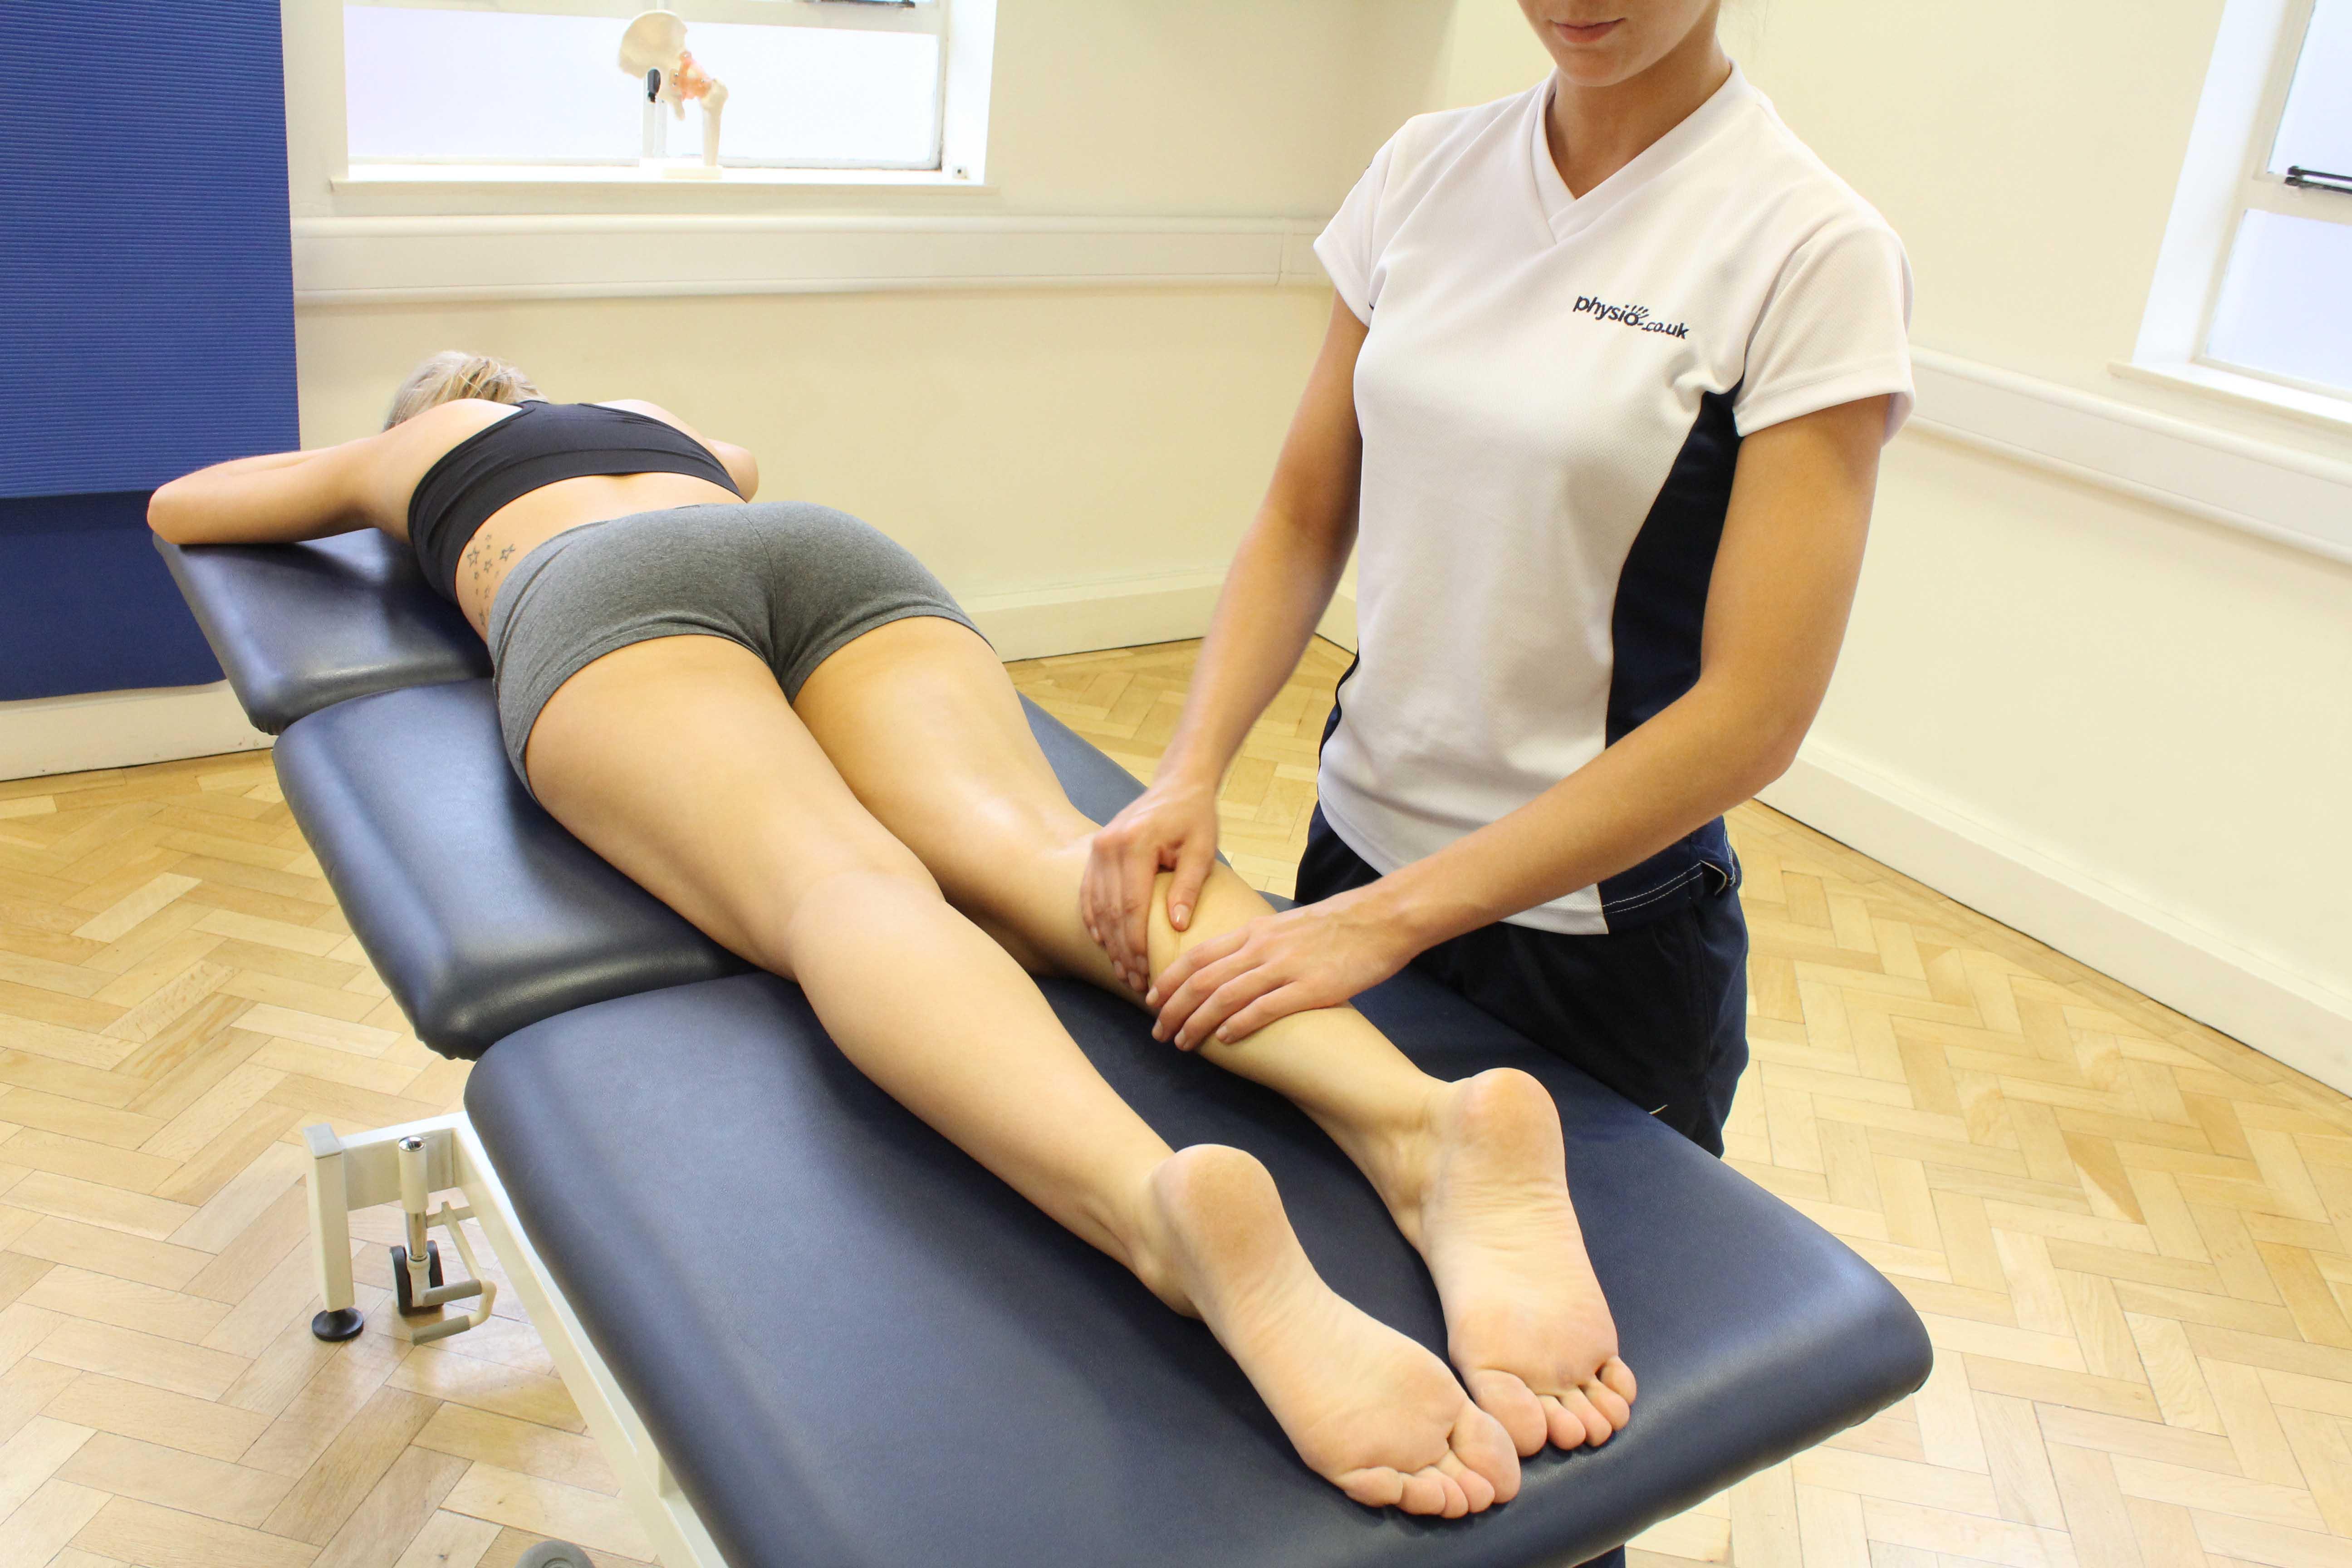 Calf-massage | Massage-for-body-parts | Massage | Treatments